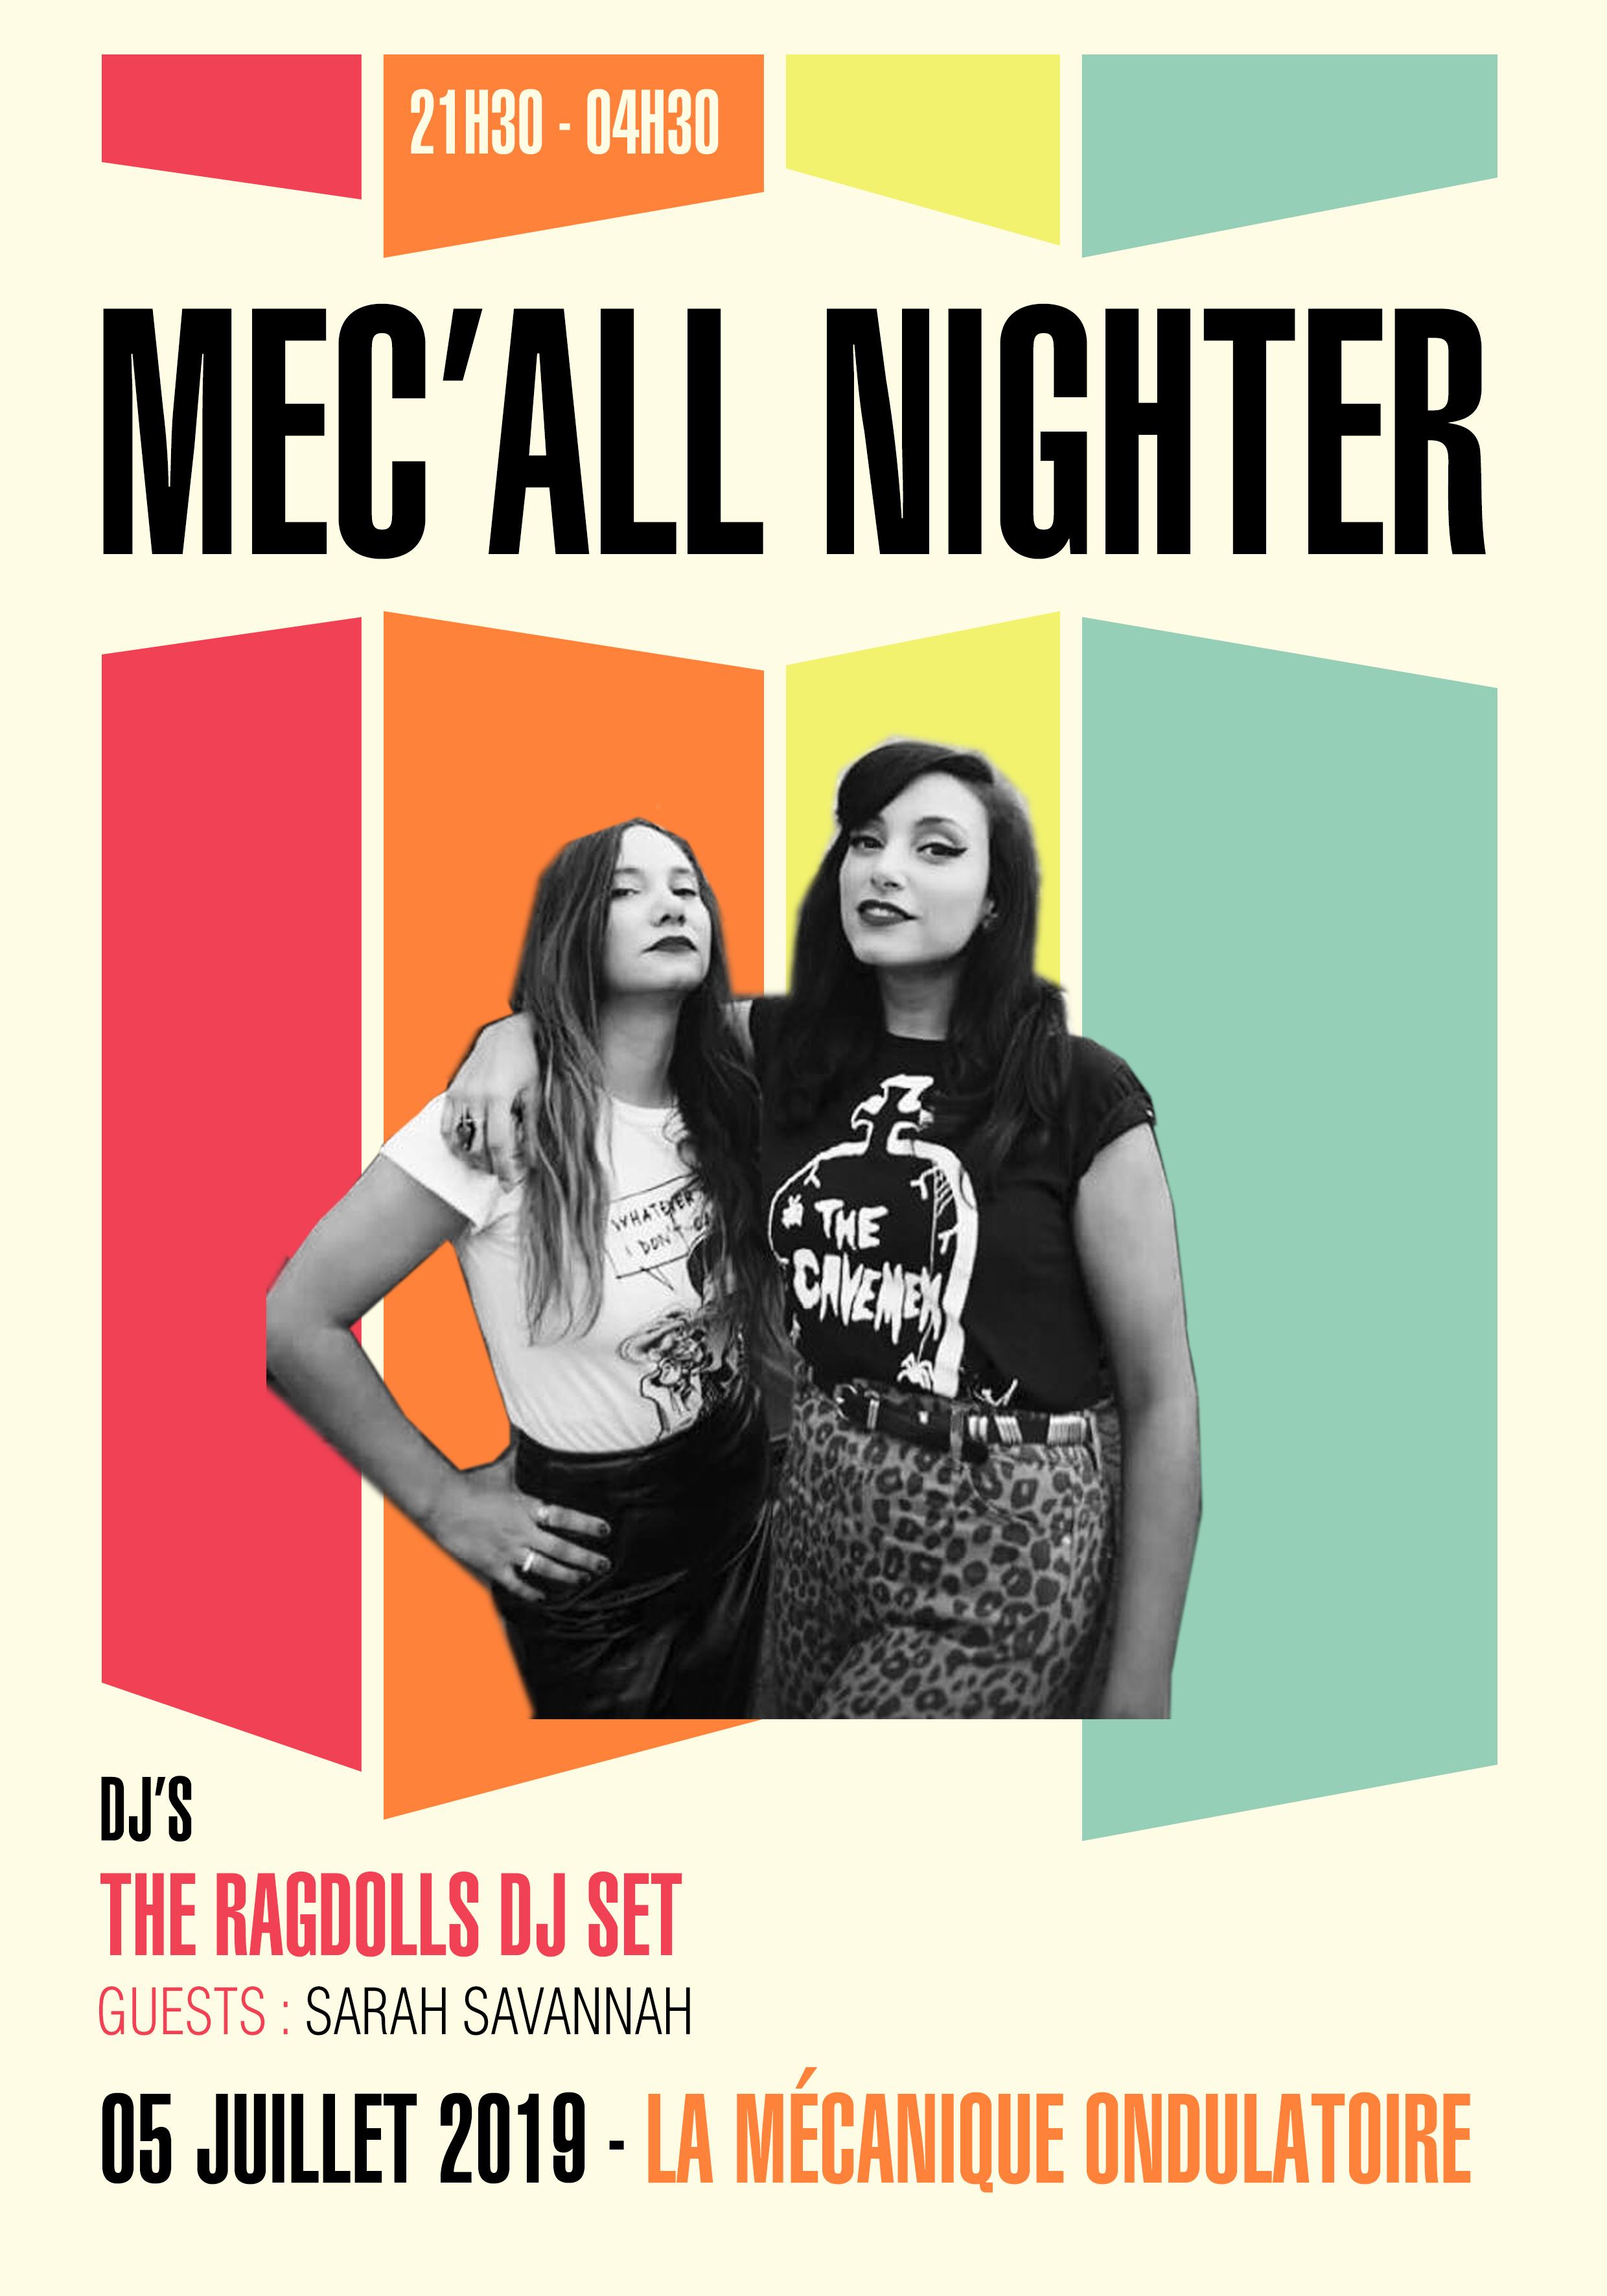 Méc'all nighter // 05.07